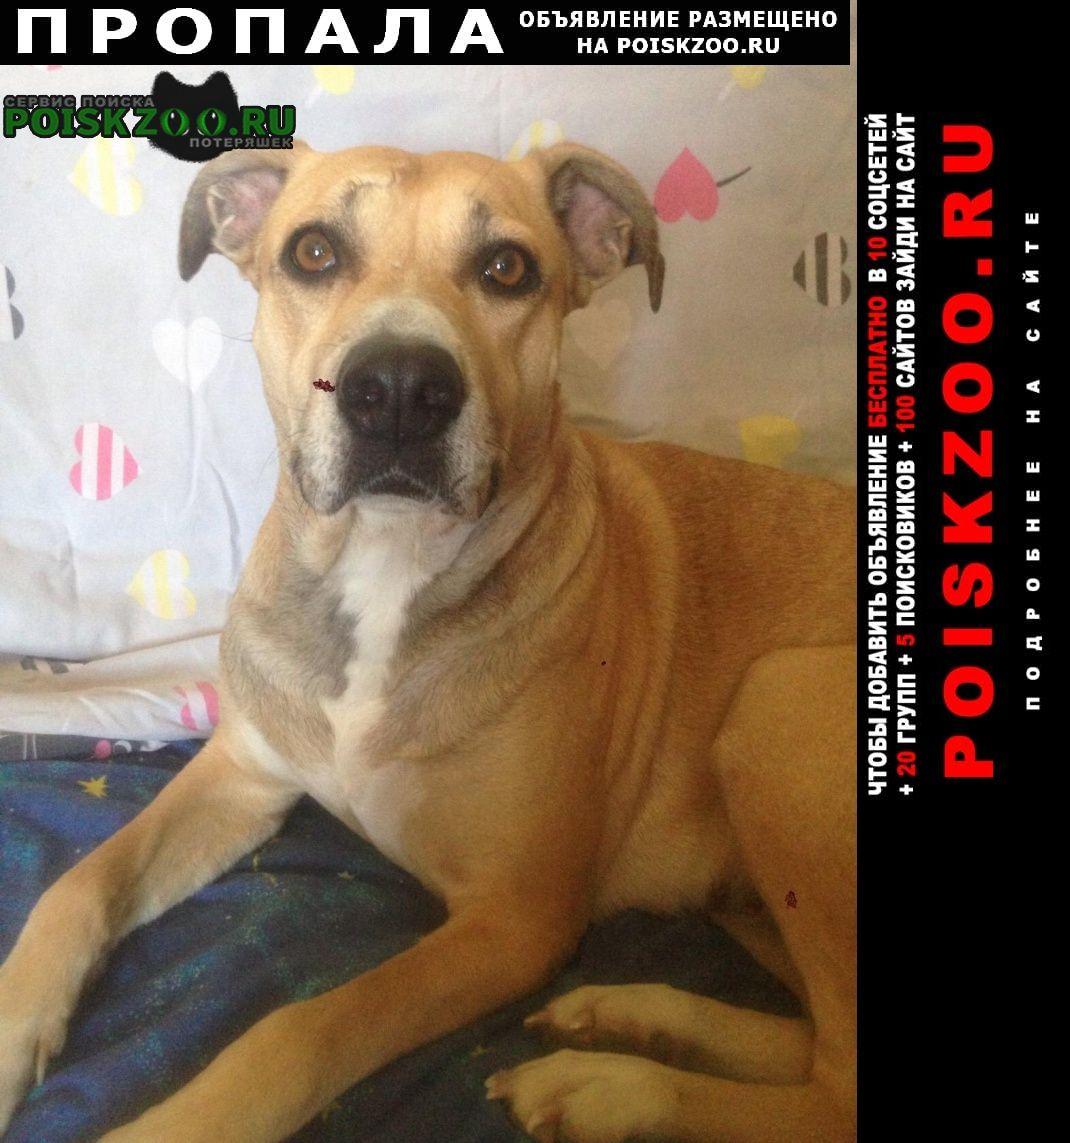 Оренбург Пропала собака объявление